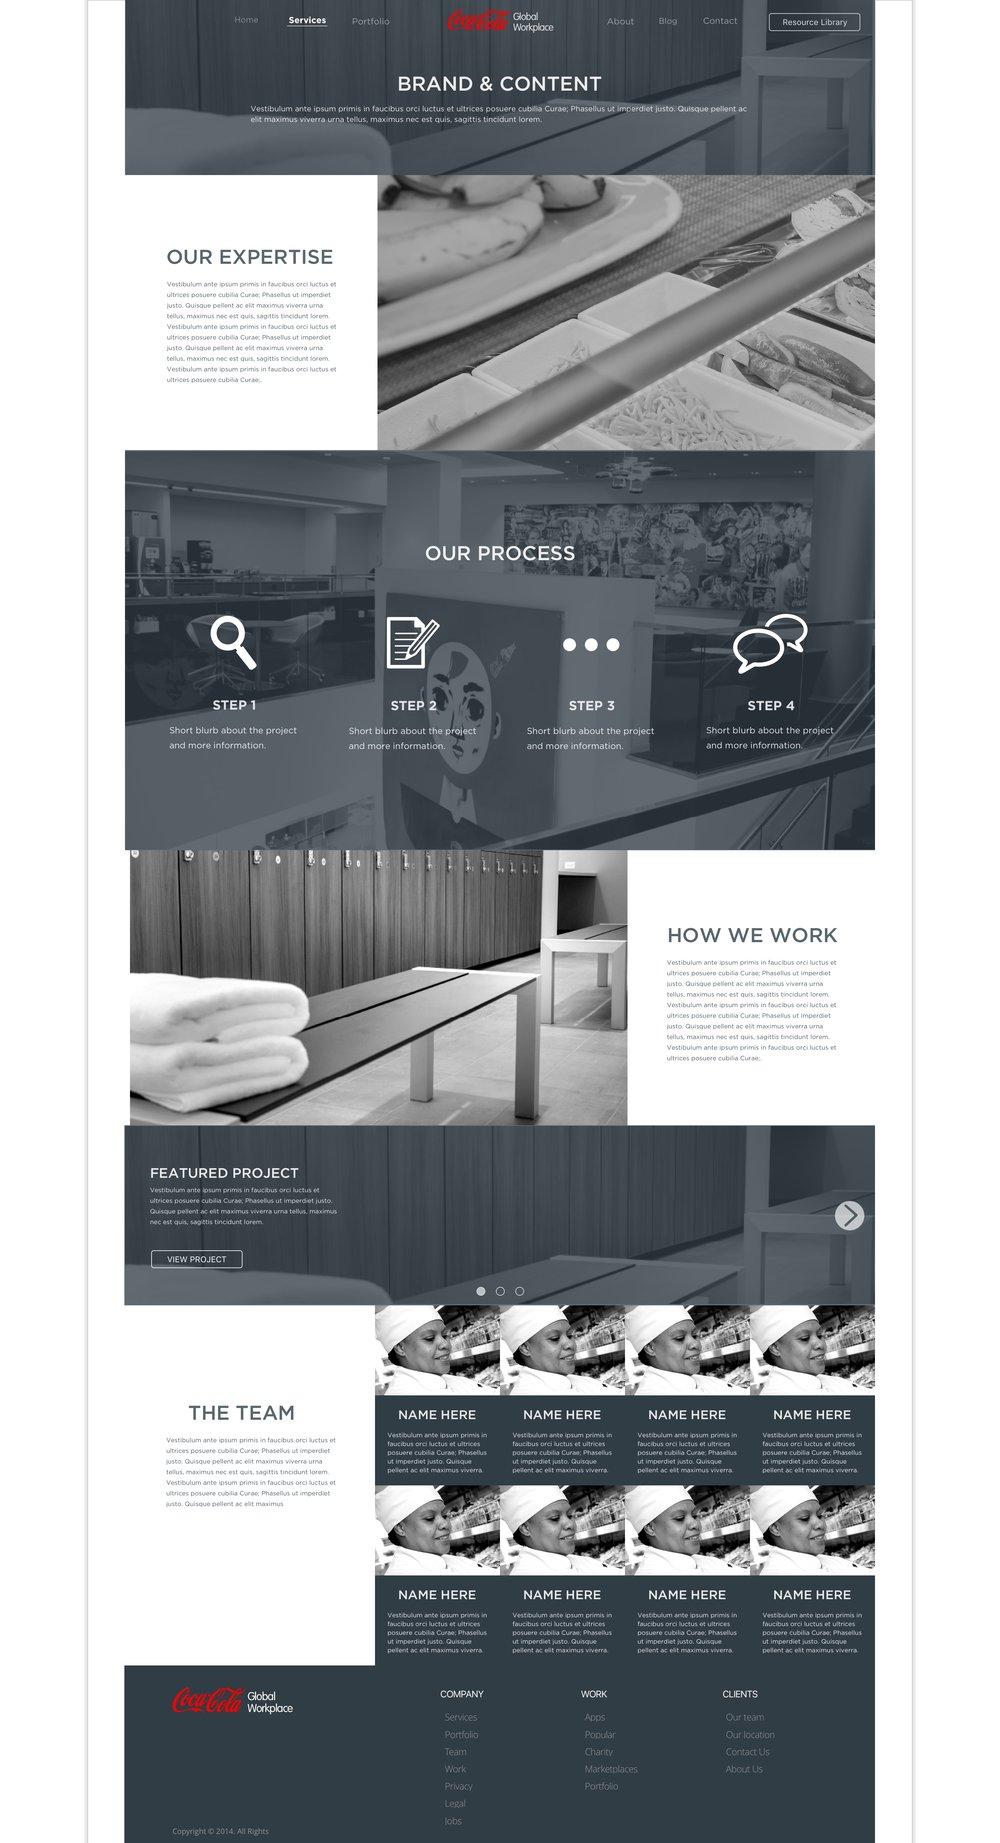 brand & content bw.jpg